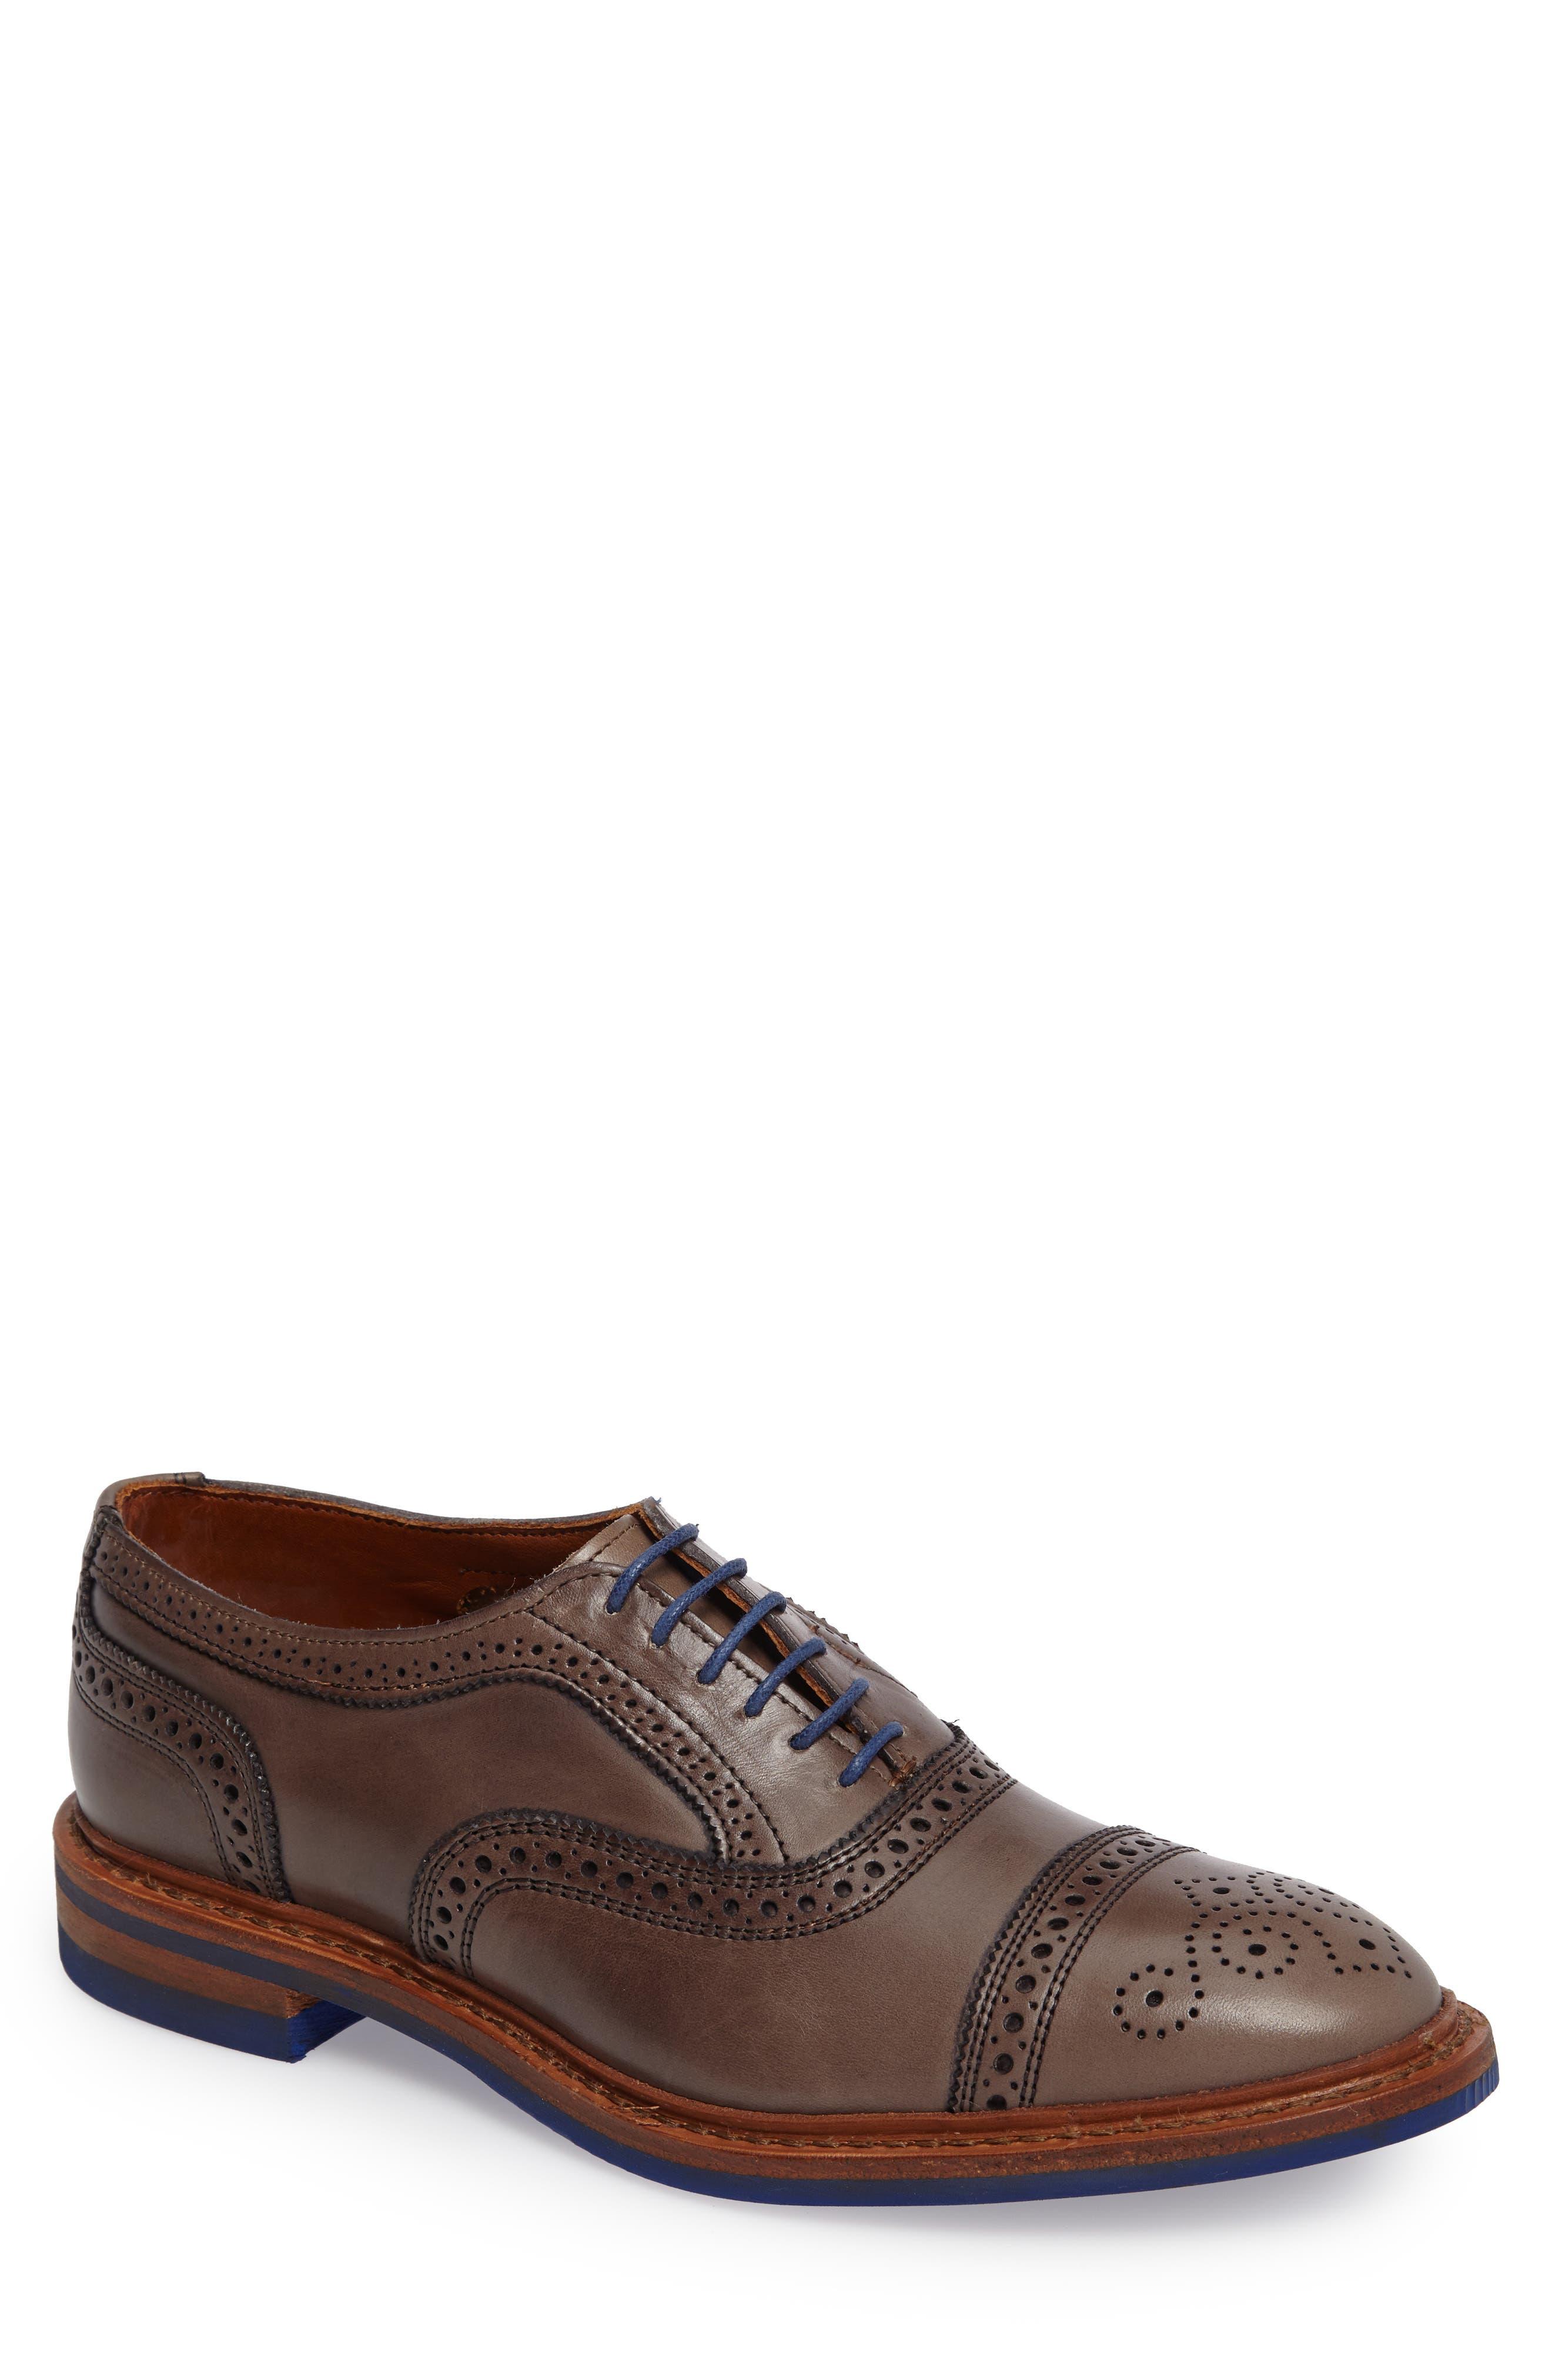 'Strandmok' Cap Toe Oxford,                             Main thumbnail 1, color,                             Grey Leather